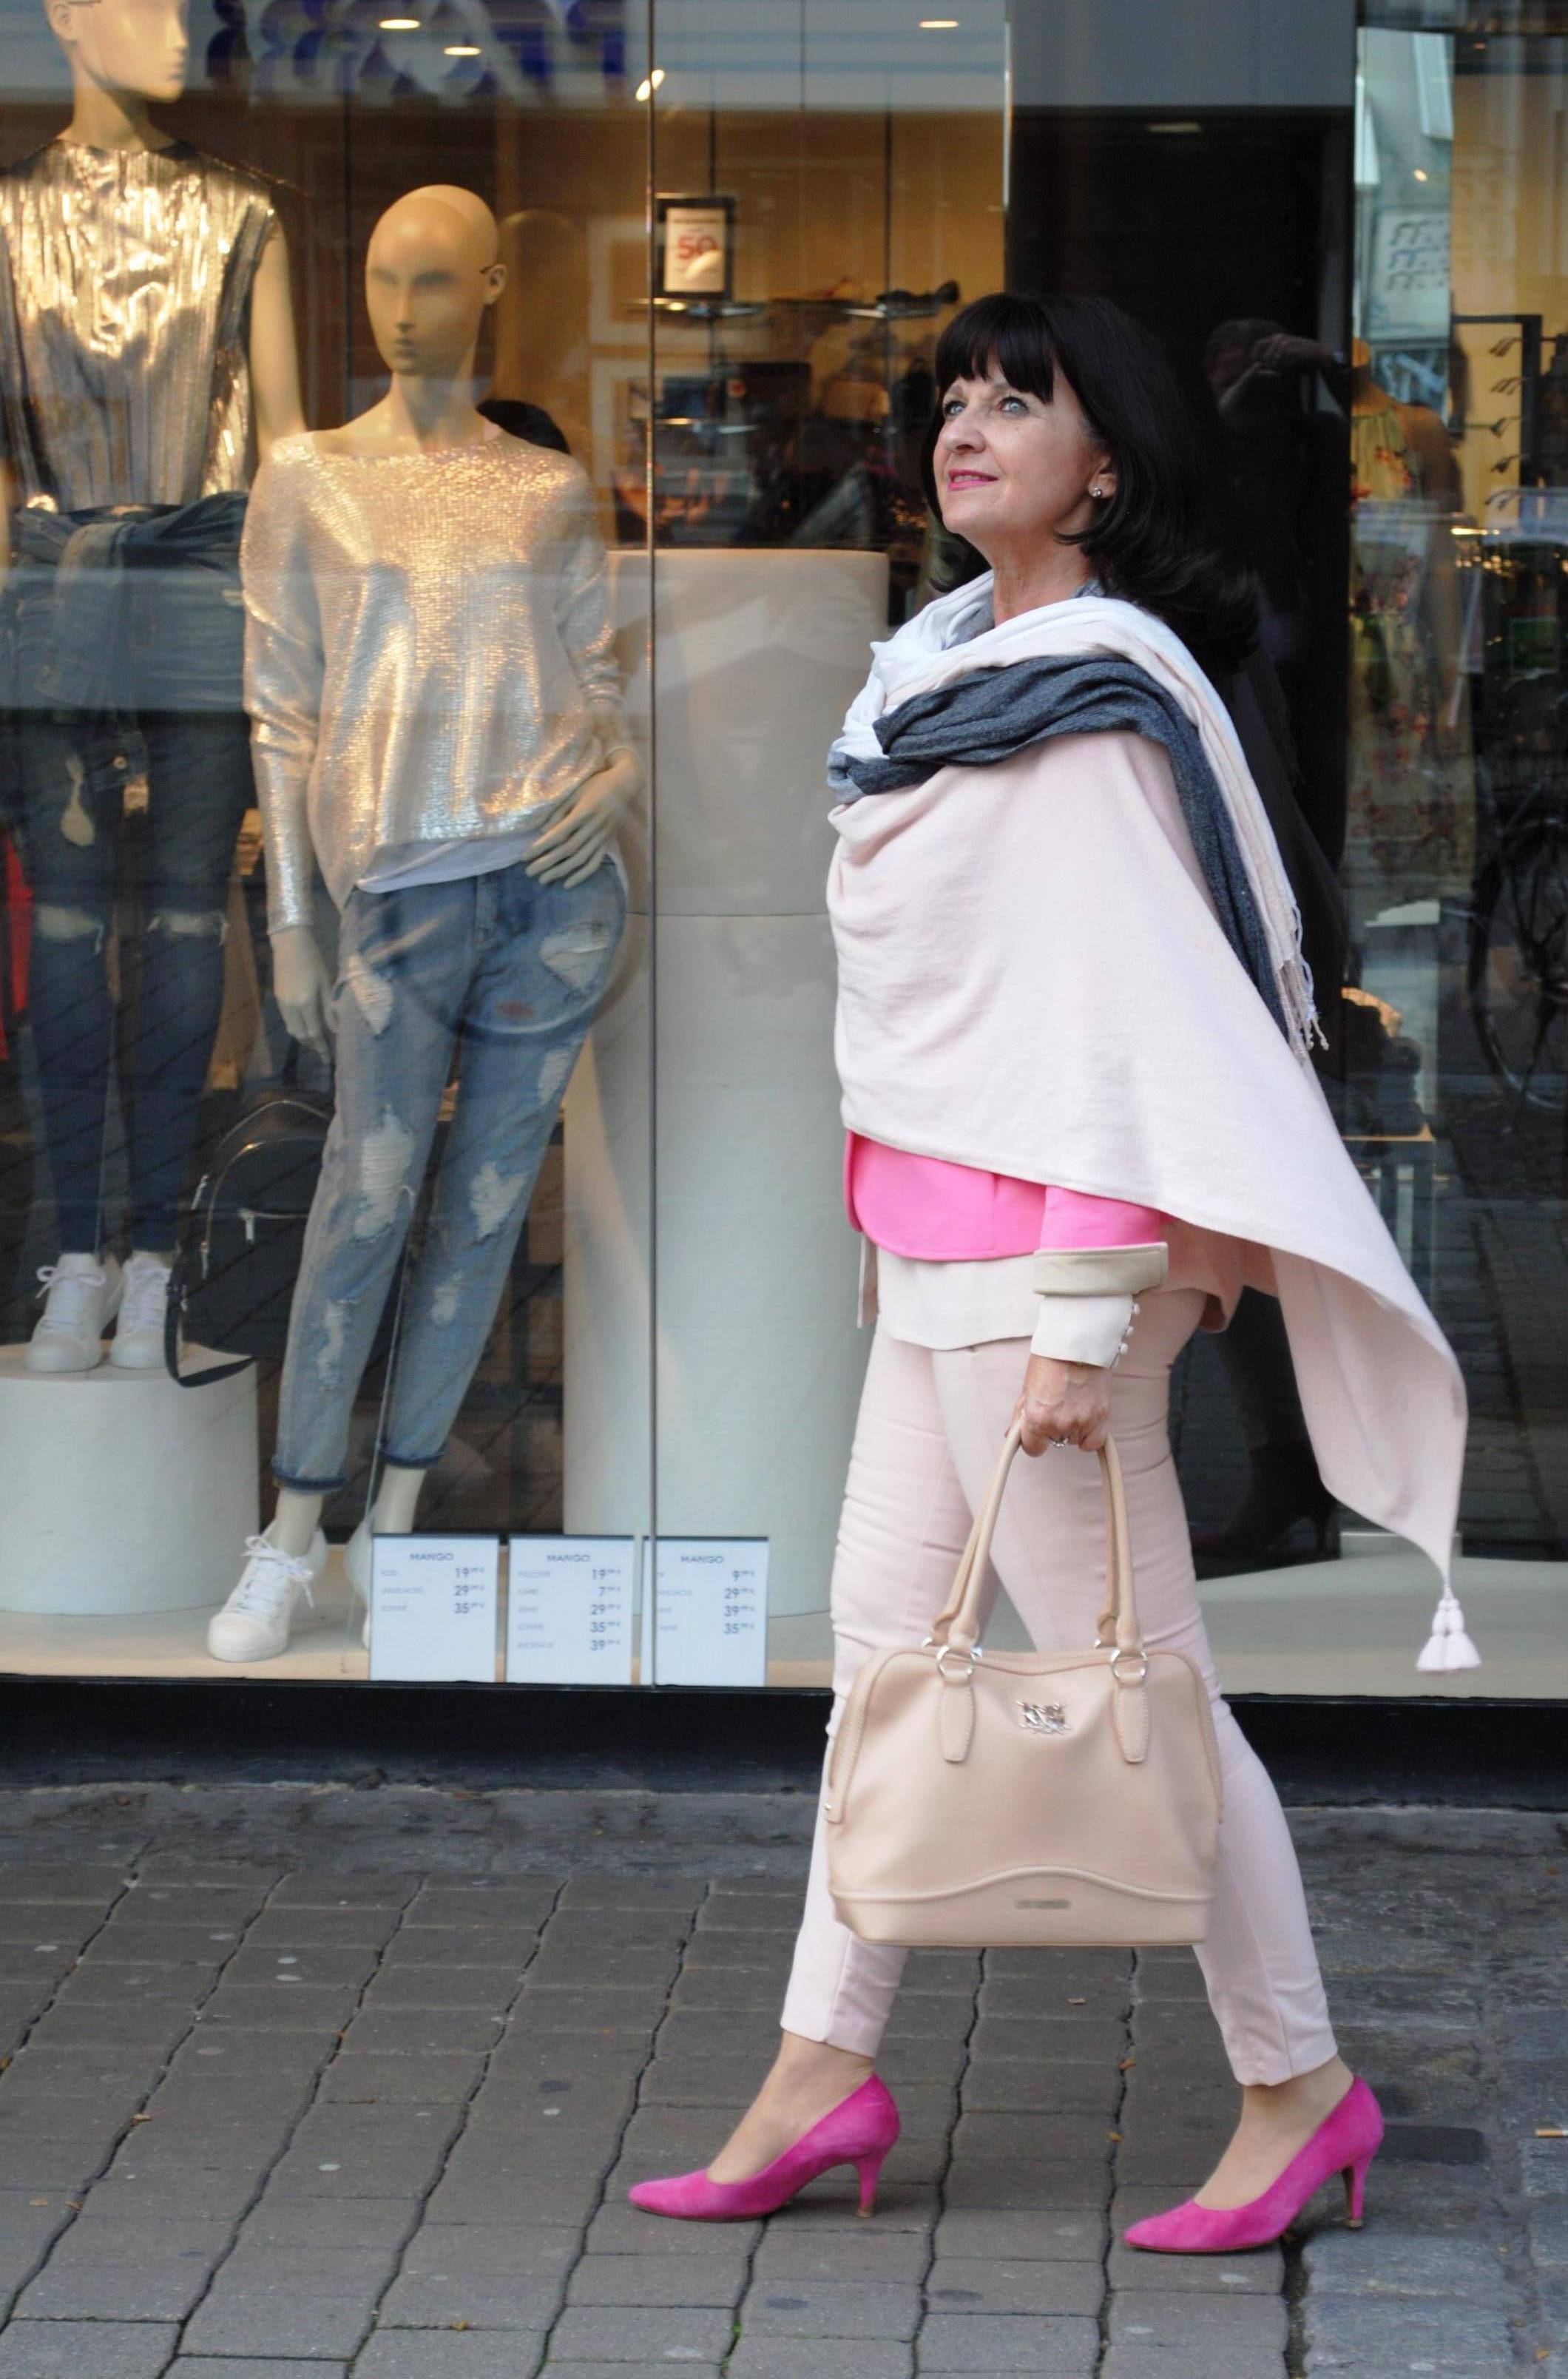 Einkaufsbegleitung mit Lady 50plus